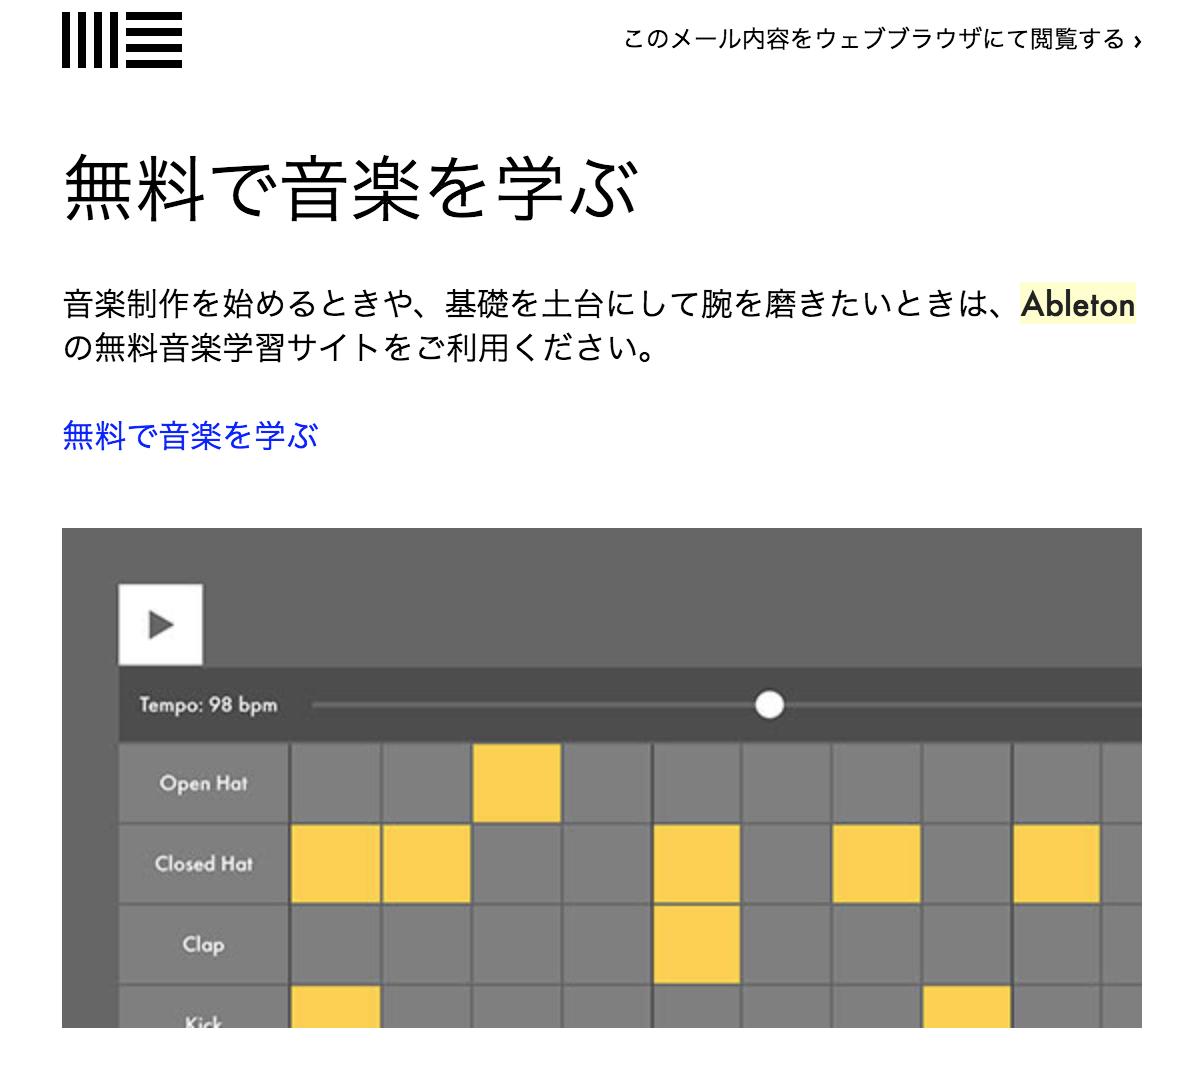 Ableton 無料で音楽を学ぶ|画像